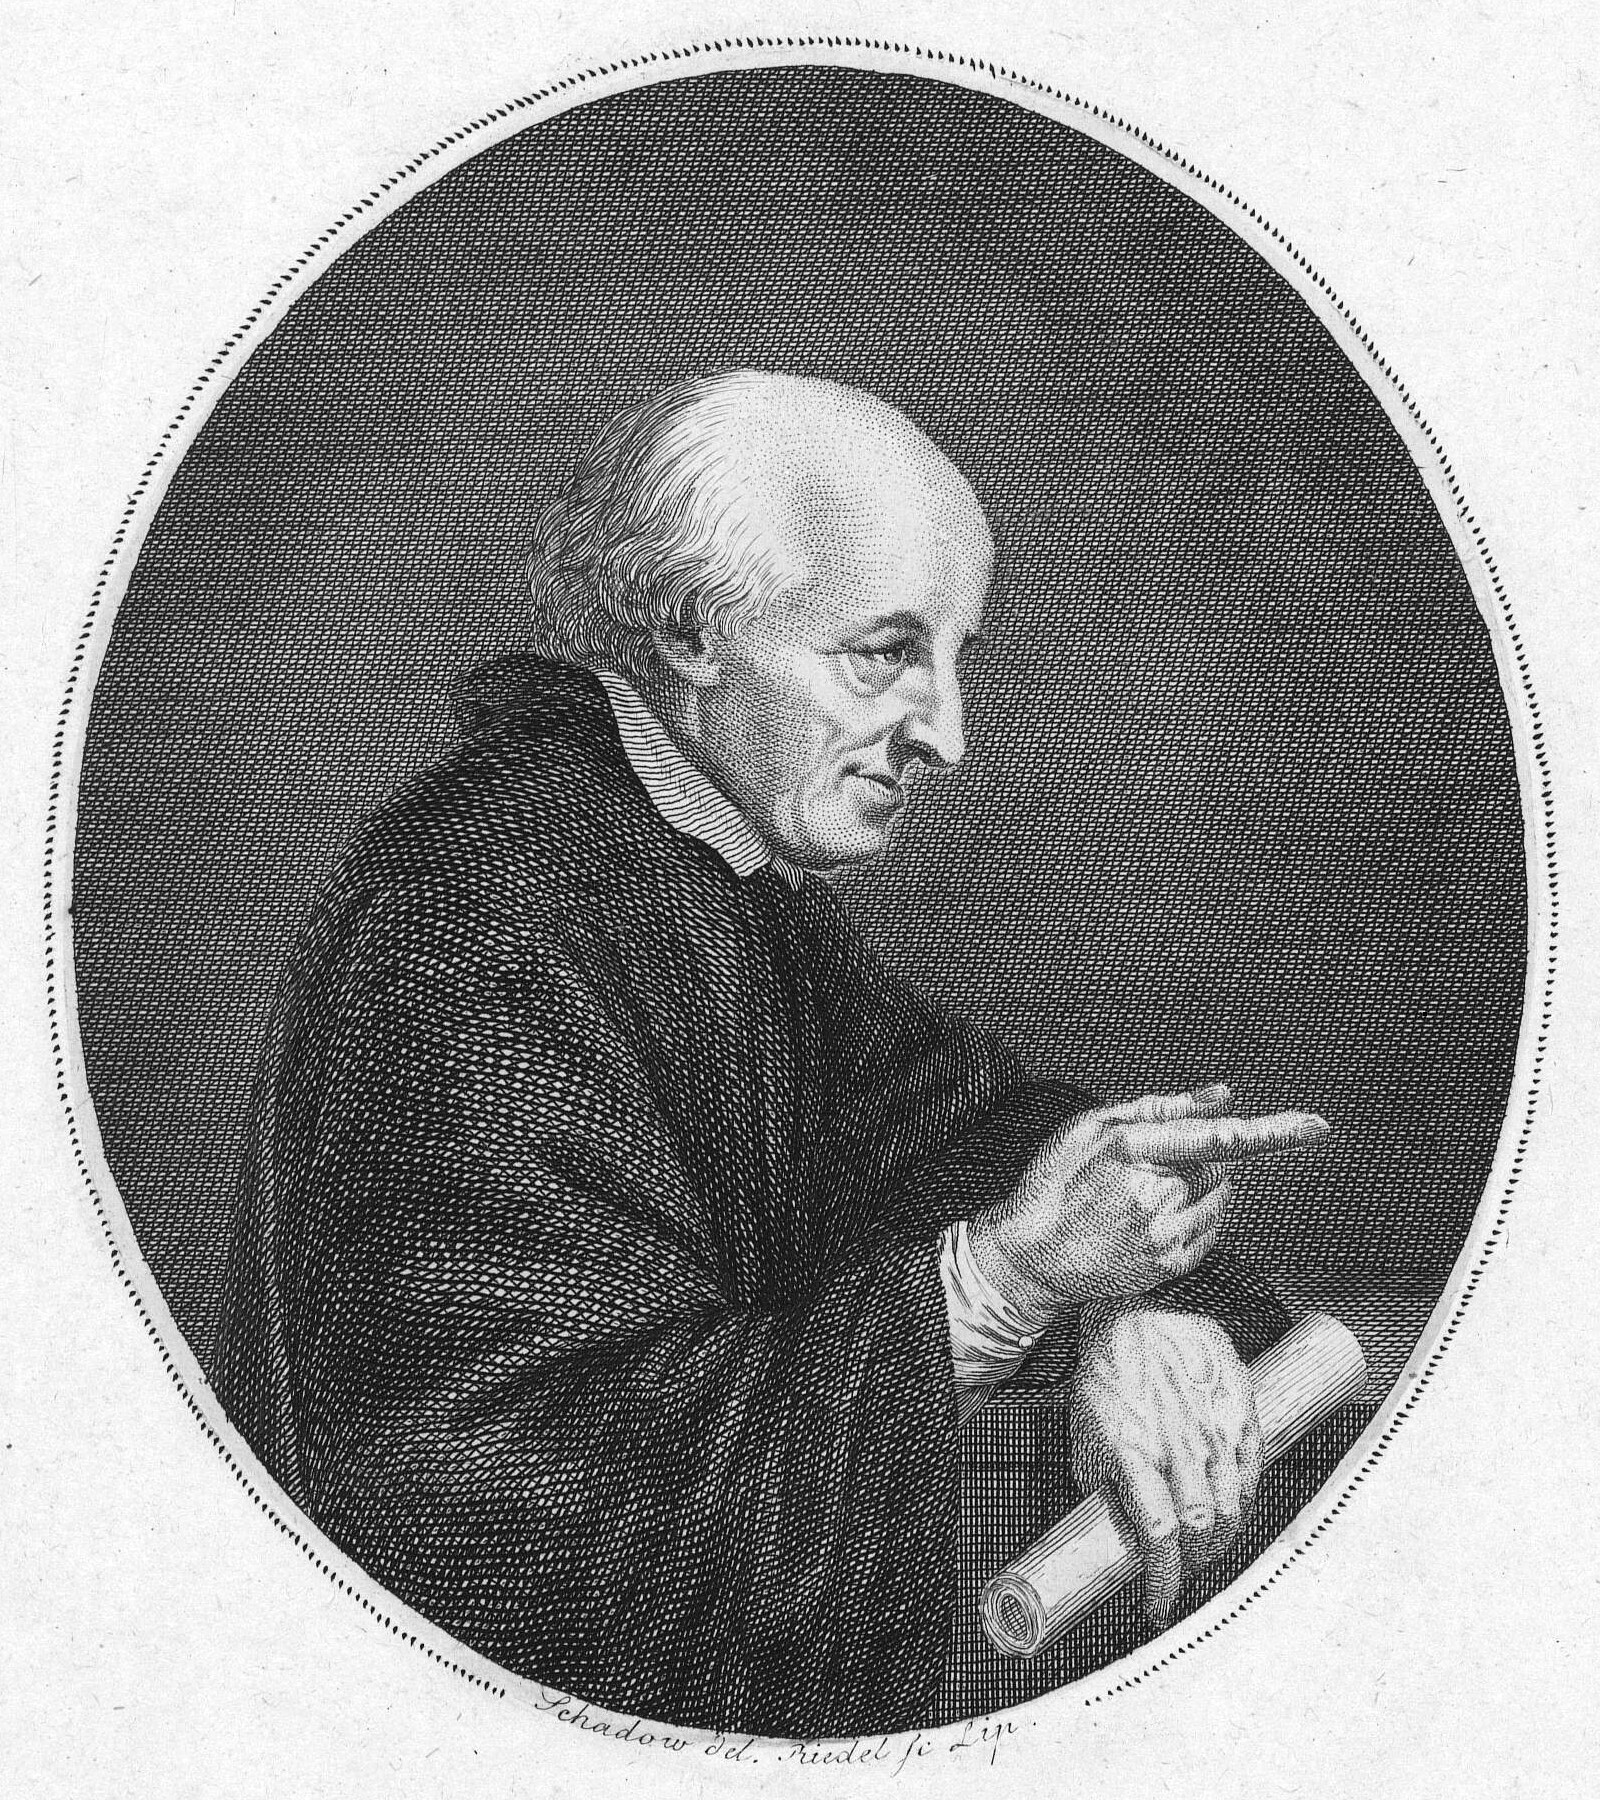 Johann Friedrich Fasch - Ingo Goritzki Oboensonaten - Oboe Sonatas - Sonatas Pour Hautbois